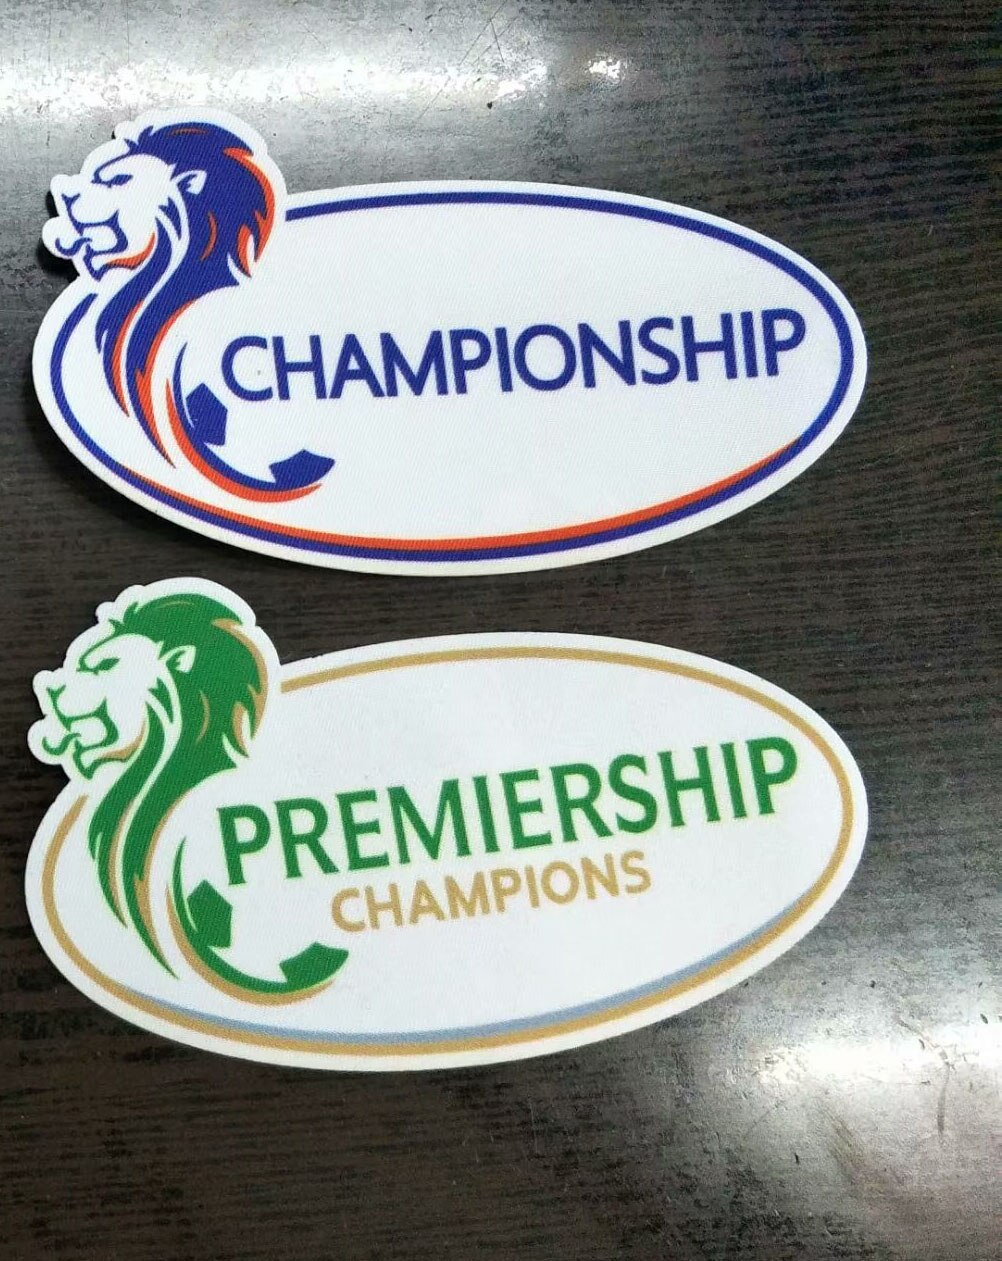 2020 Scottish Champions Patch Heat Transfer Soccer Badge